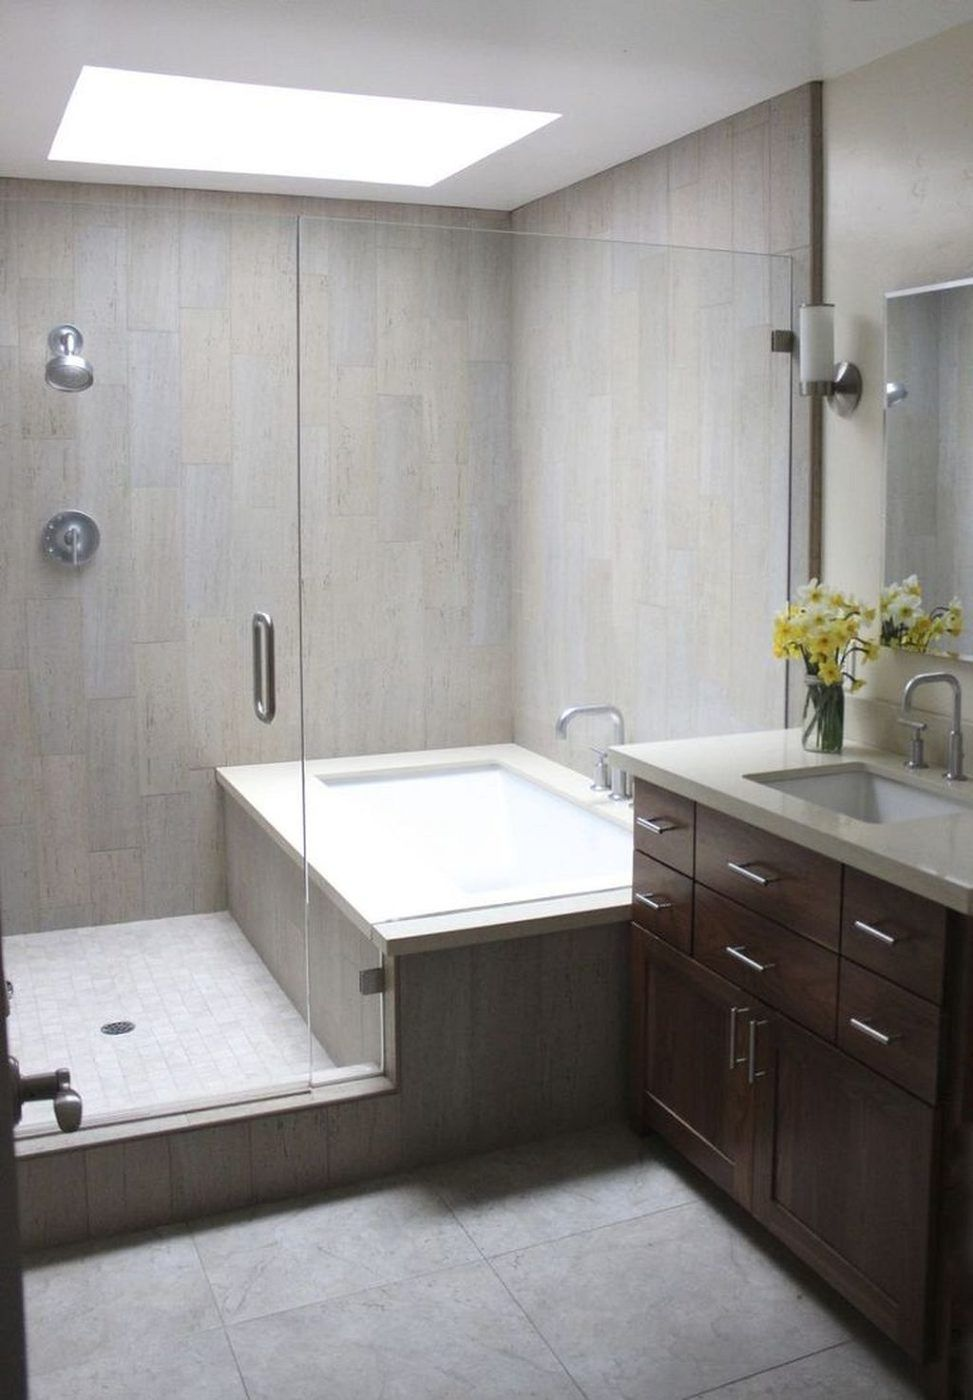 Tiny Bathroom Tub Shower Combo Remodeling Ideas 50   Bathroom tub ...